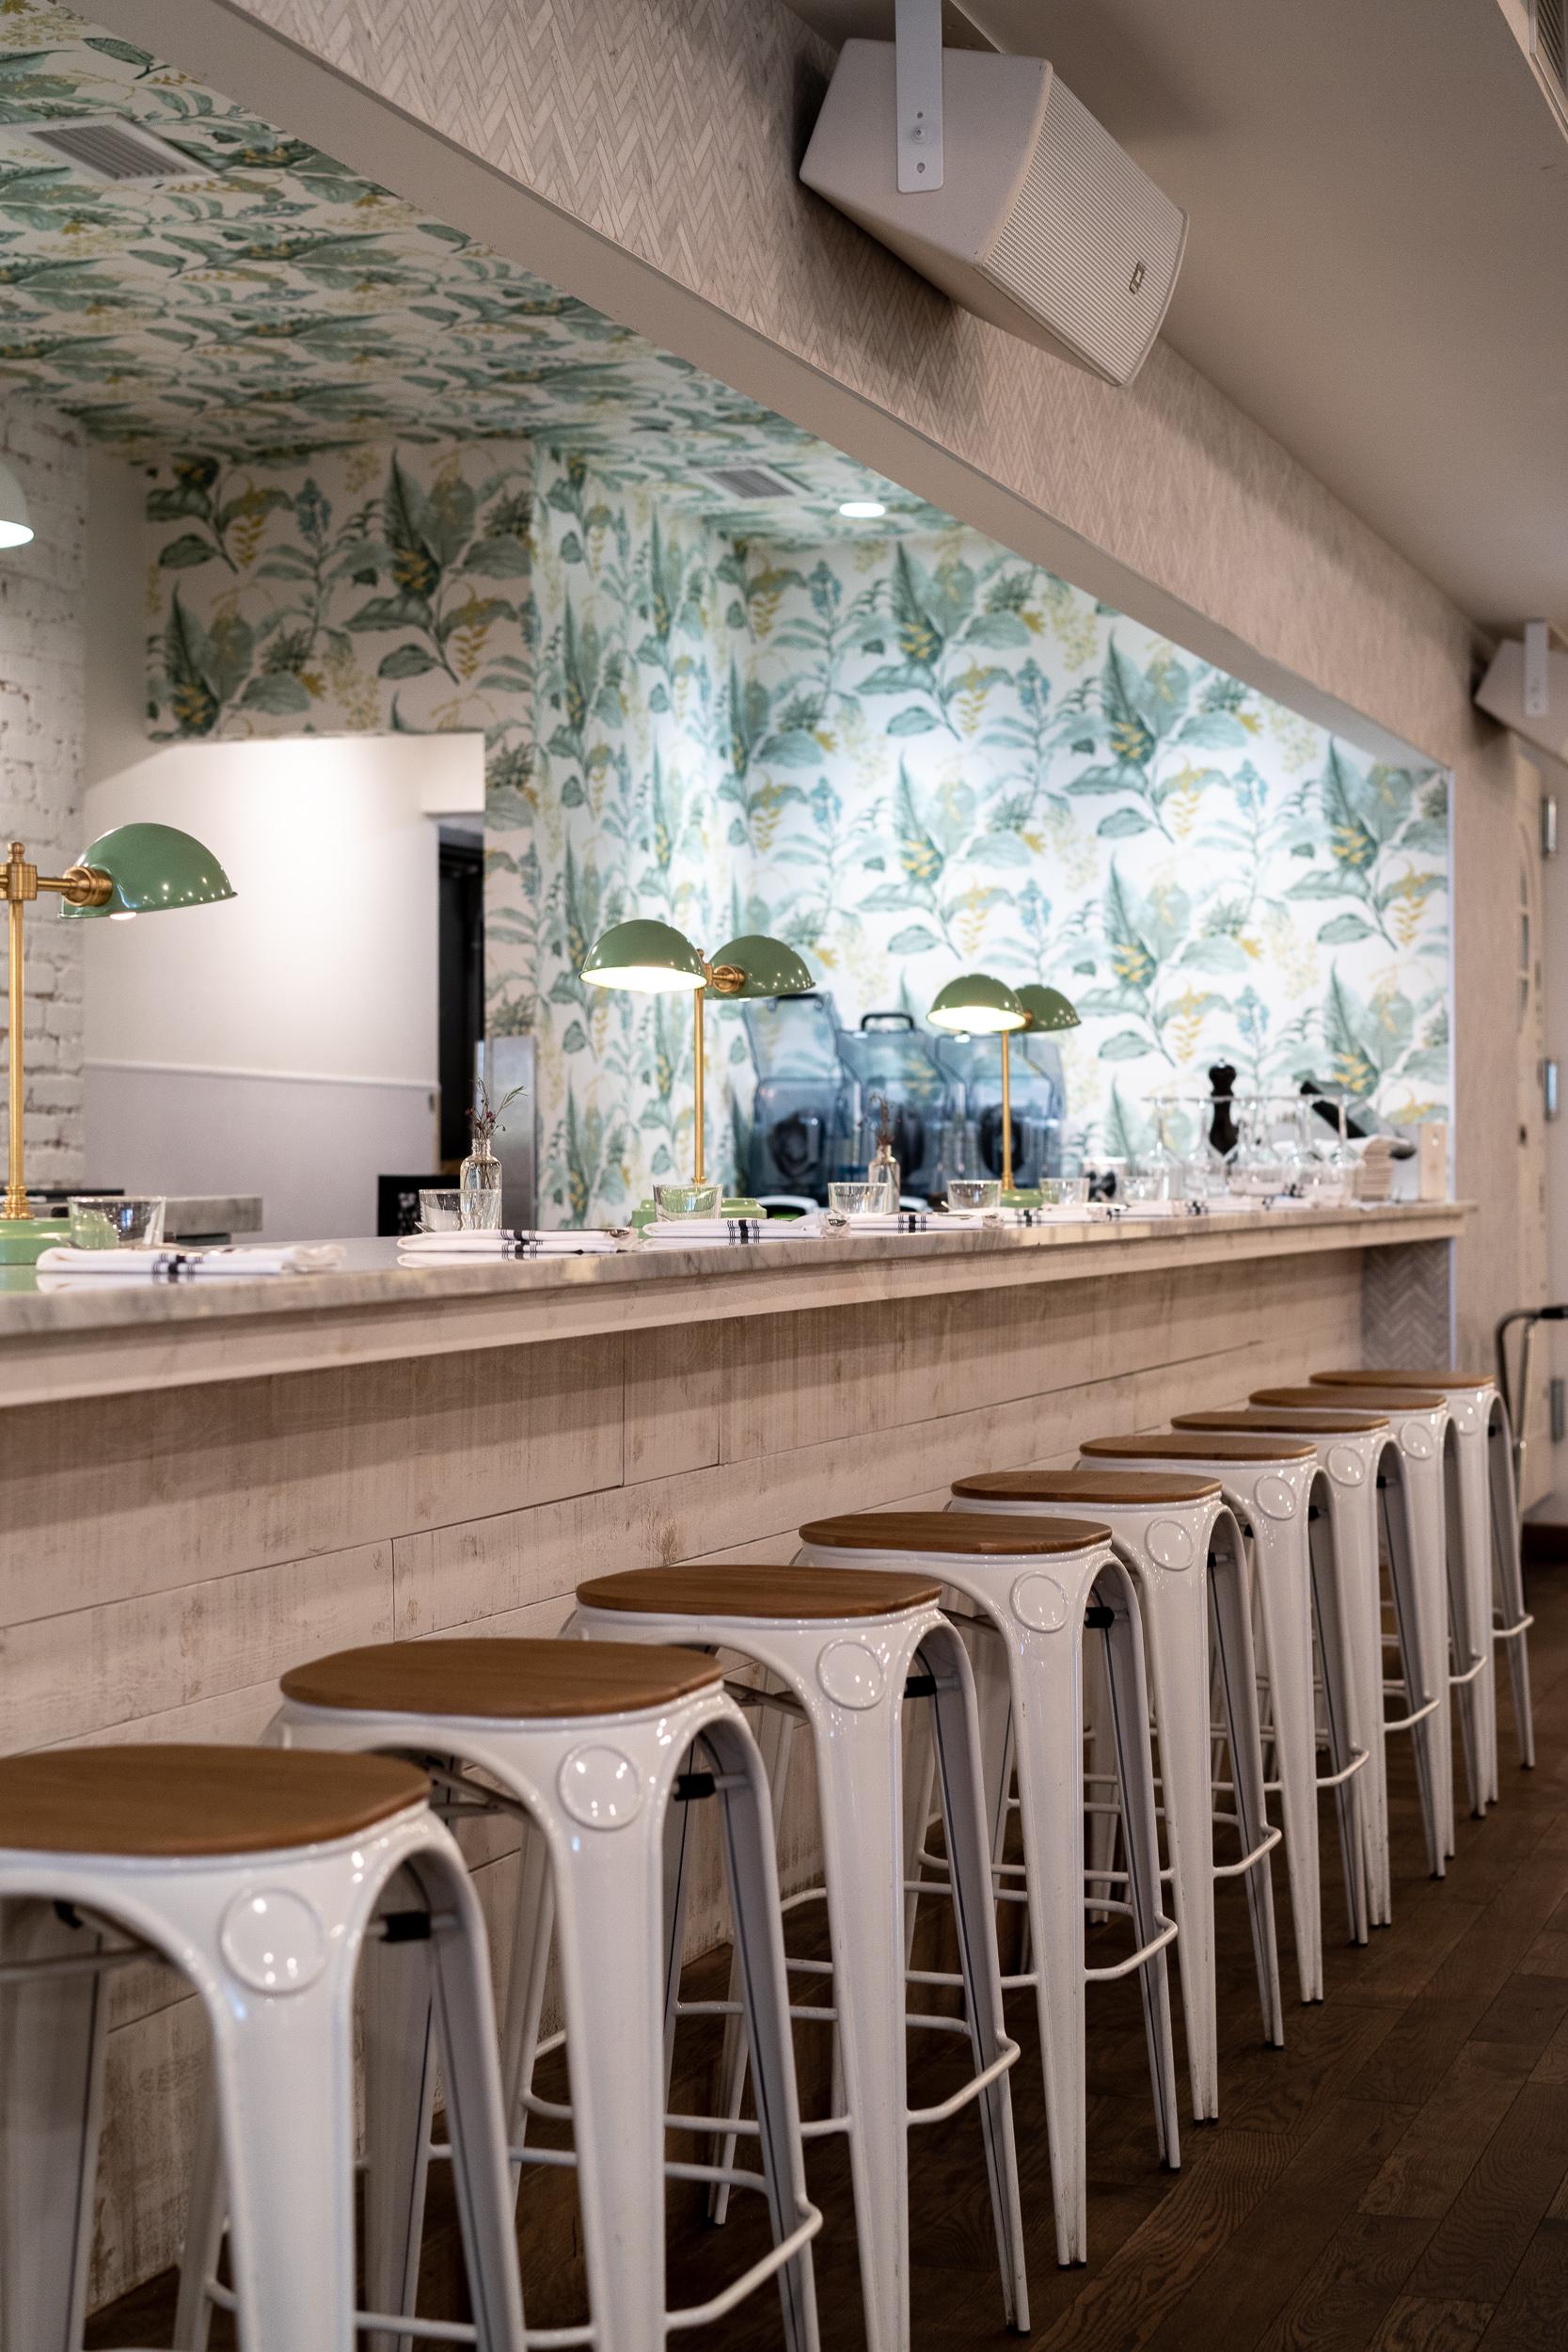 Beautiful wallpaper in the back bar area.